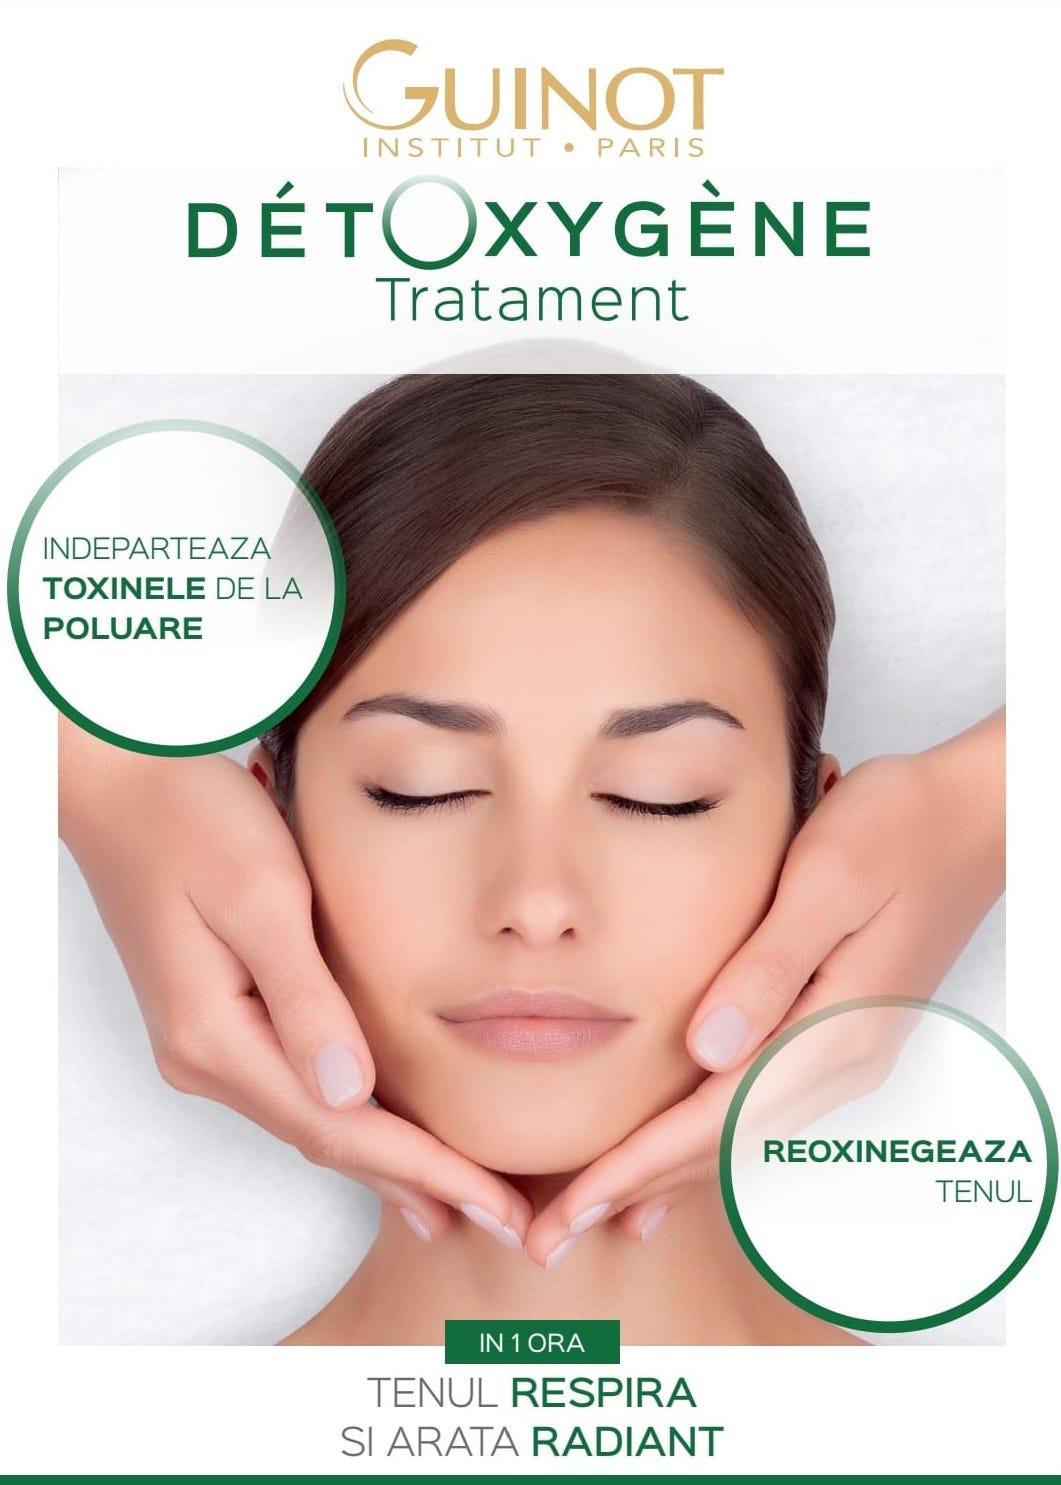 Tratament Detoxygene Guinot Salon Elia Studio Suceava